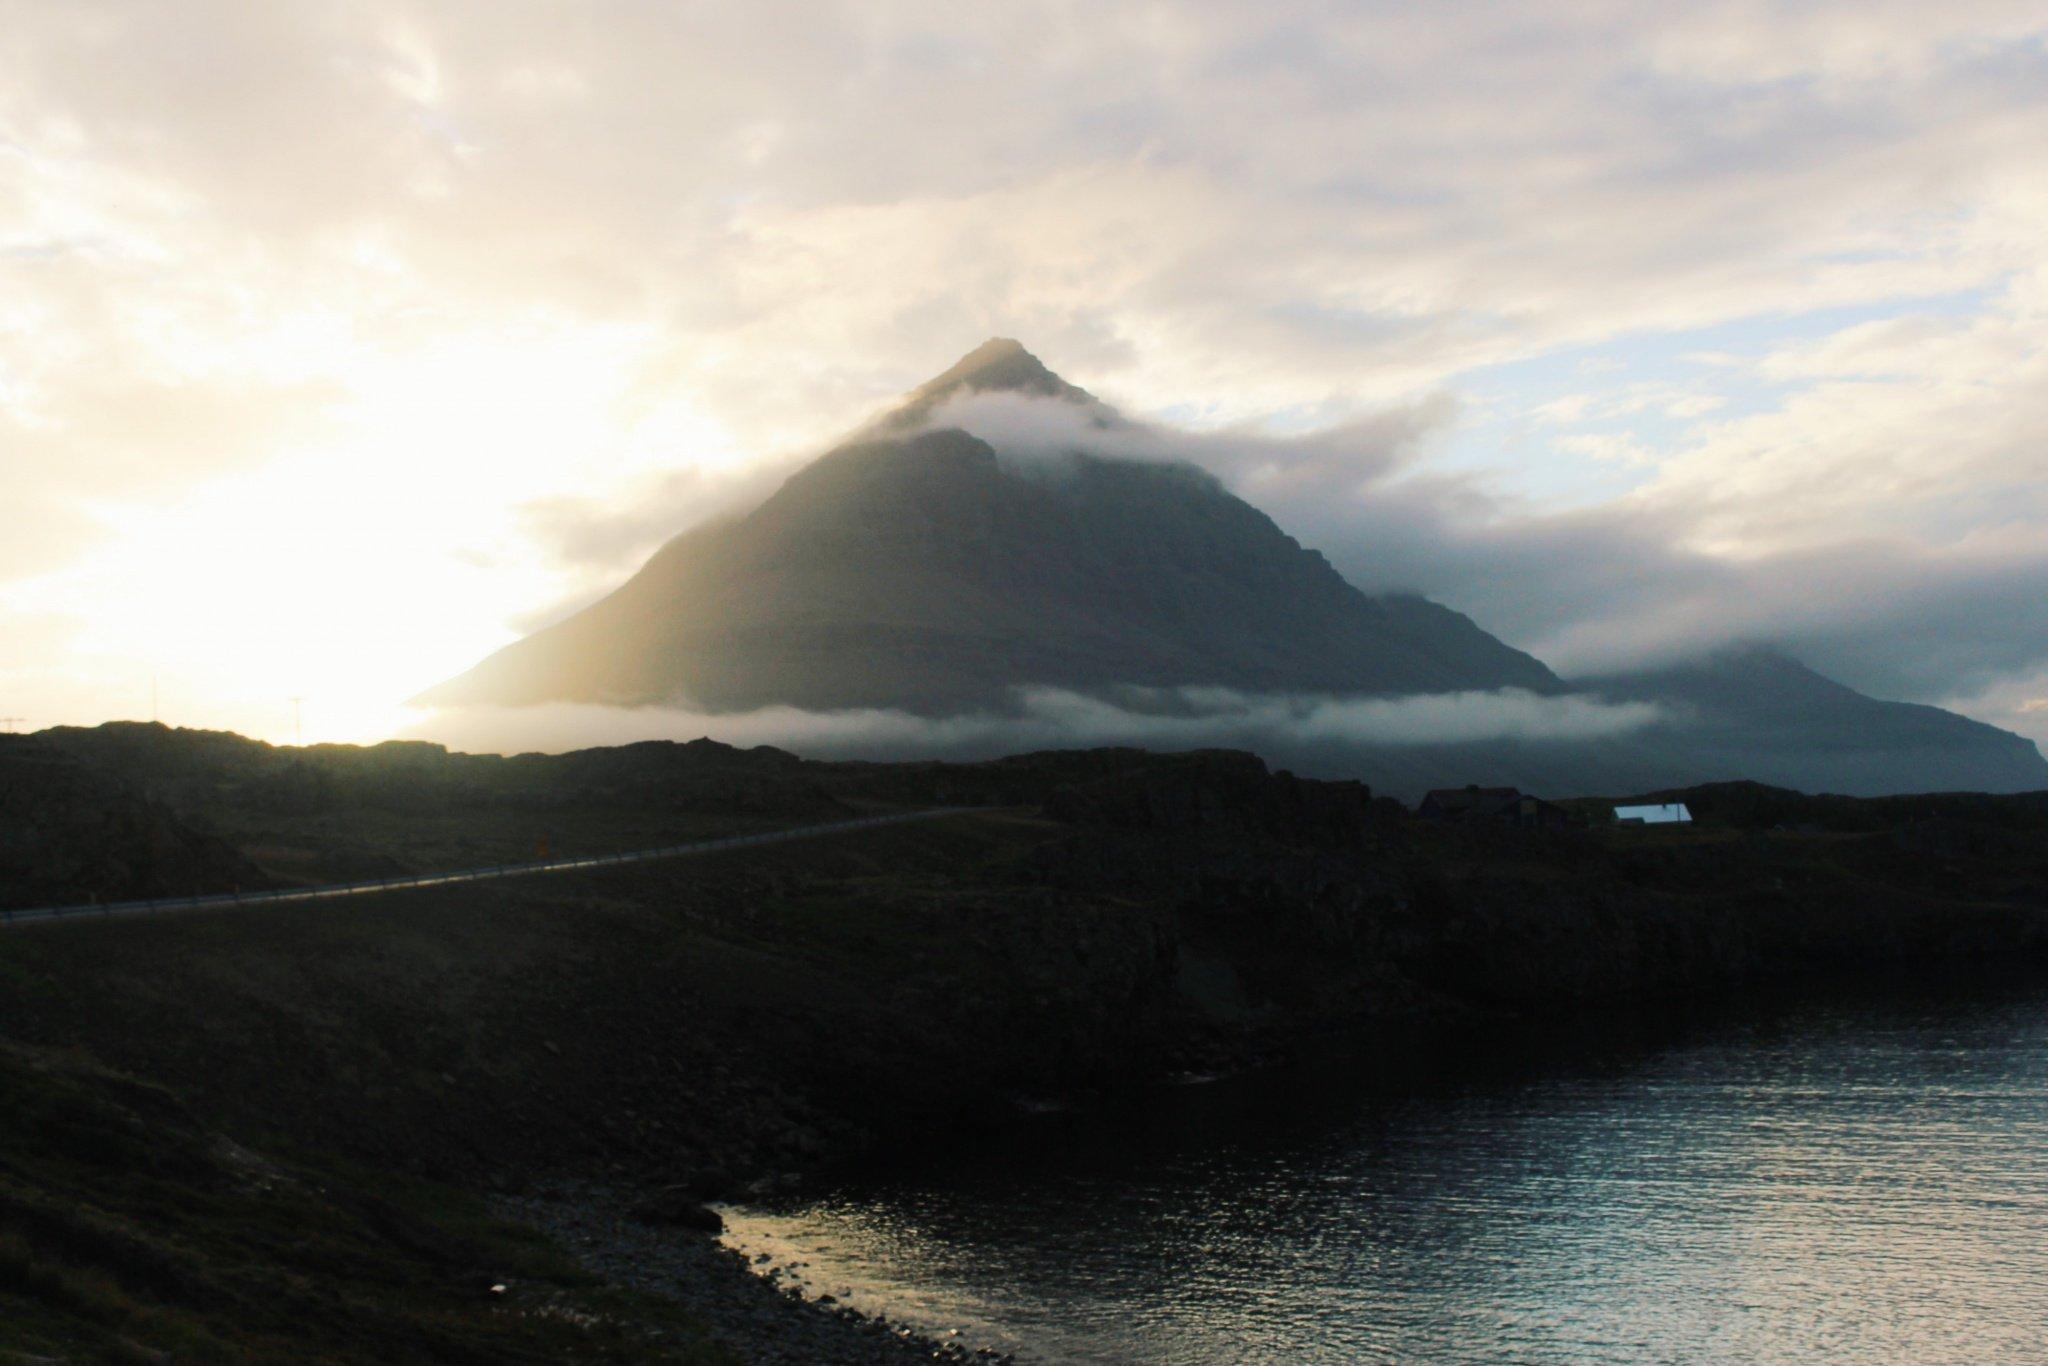 Sunset near East Fjords, Iceland